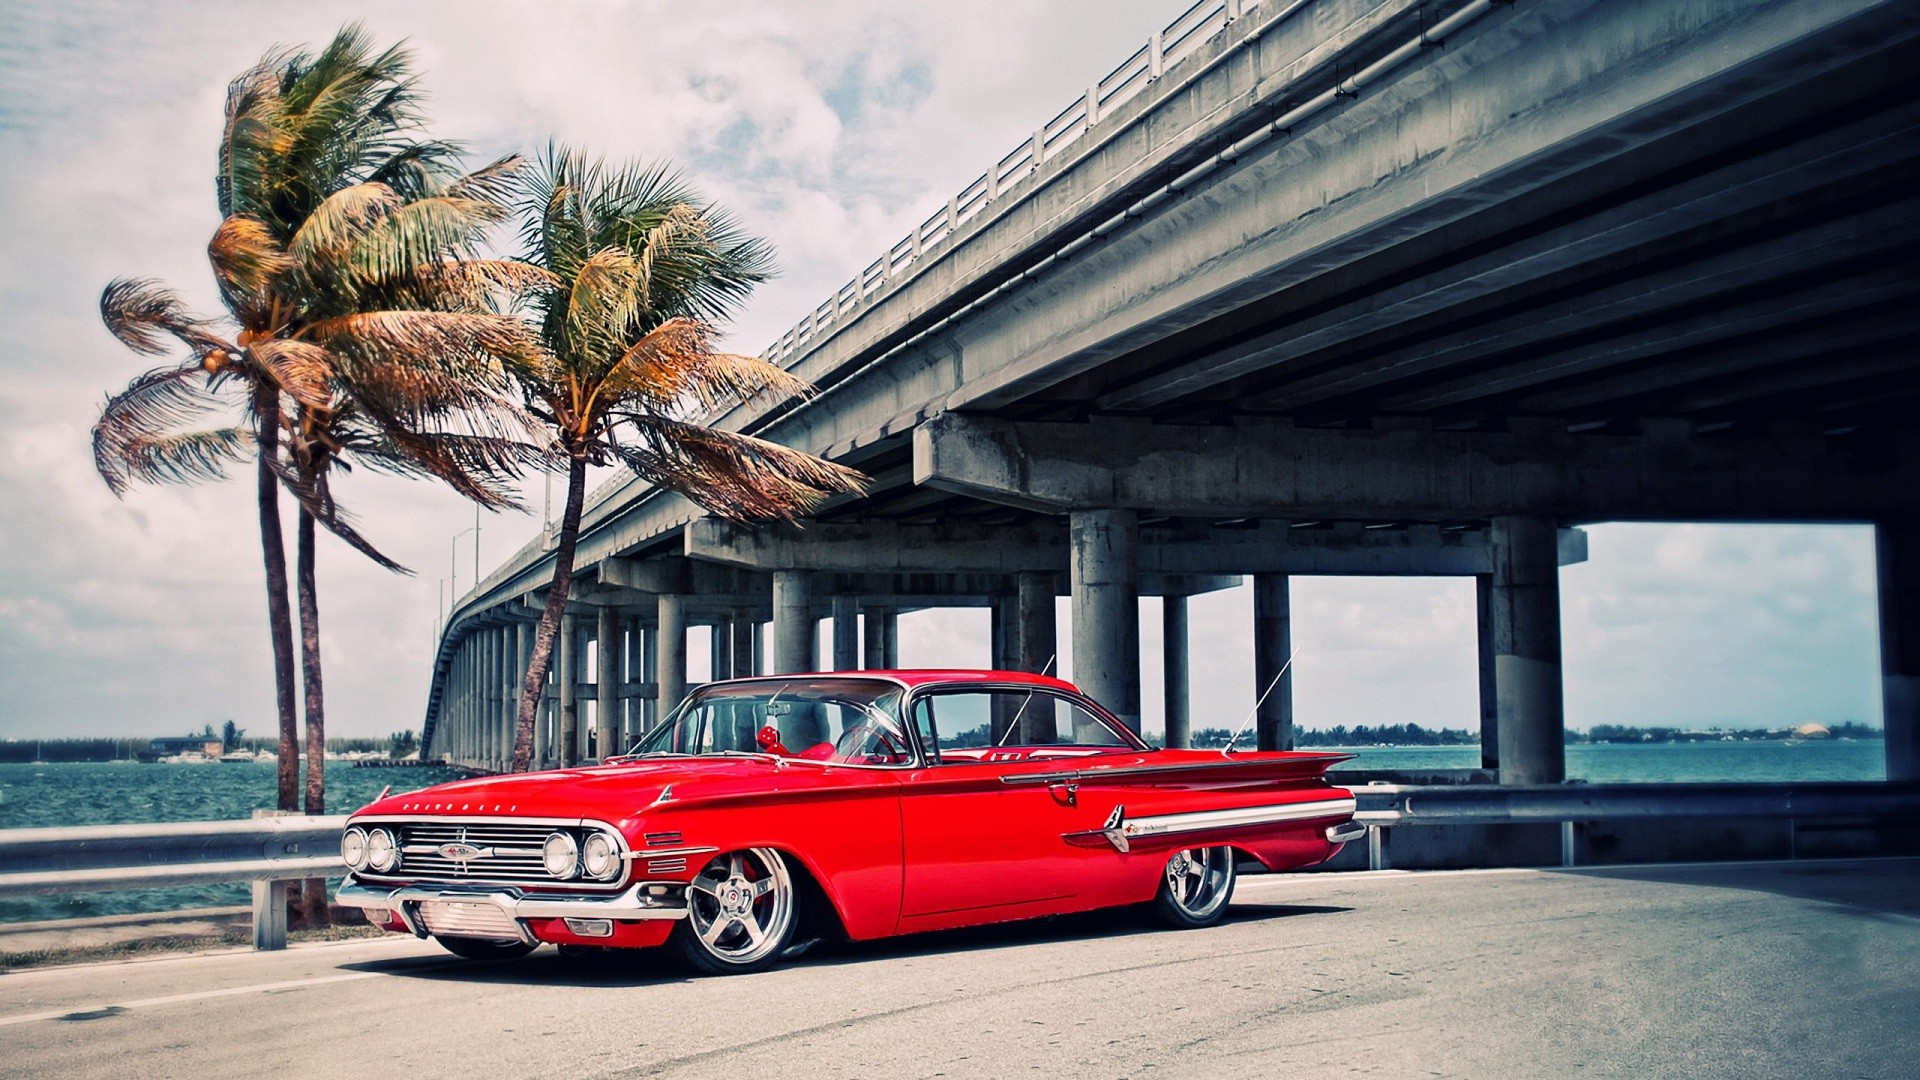 General 1920x1080 car red cars palm trees bridge wind Oldtimer vehicle